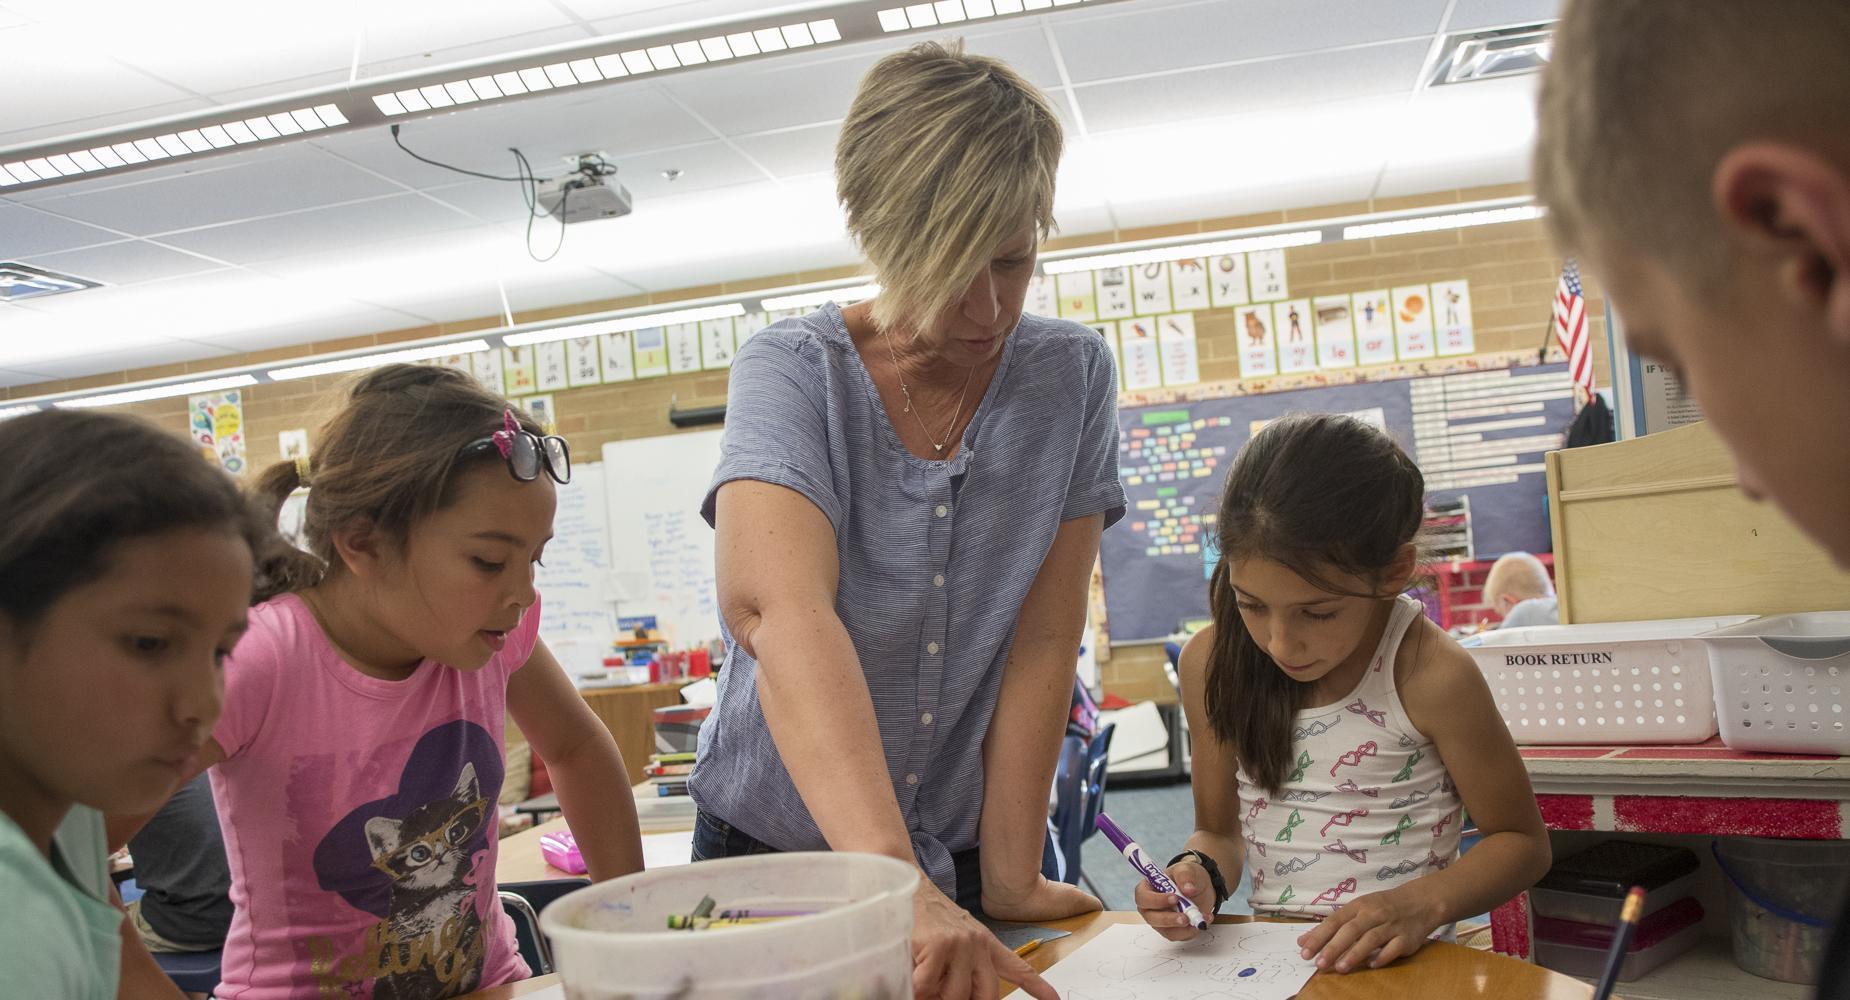 Teacher at desk helping three girls with their class work.